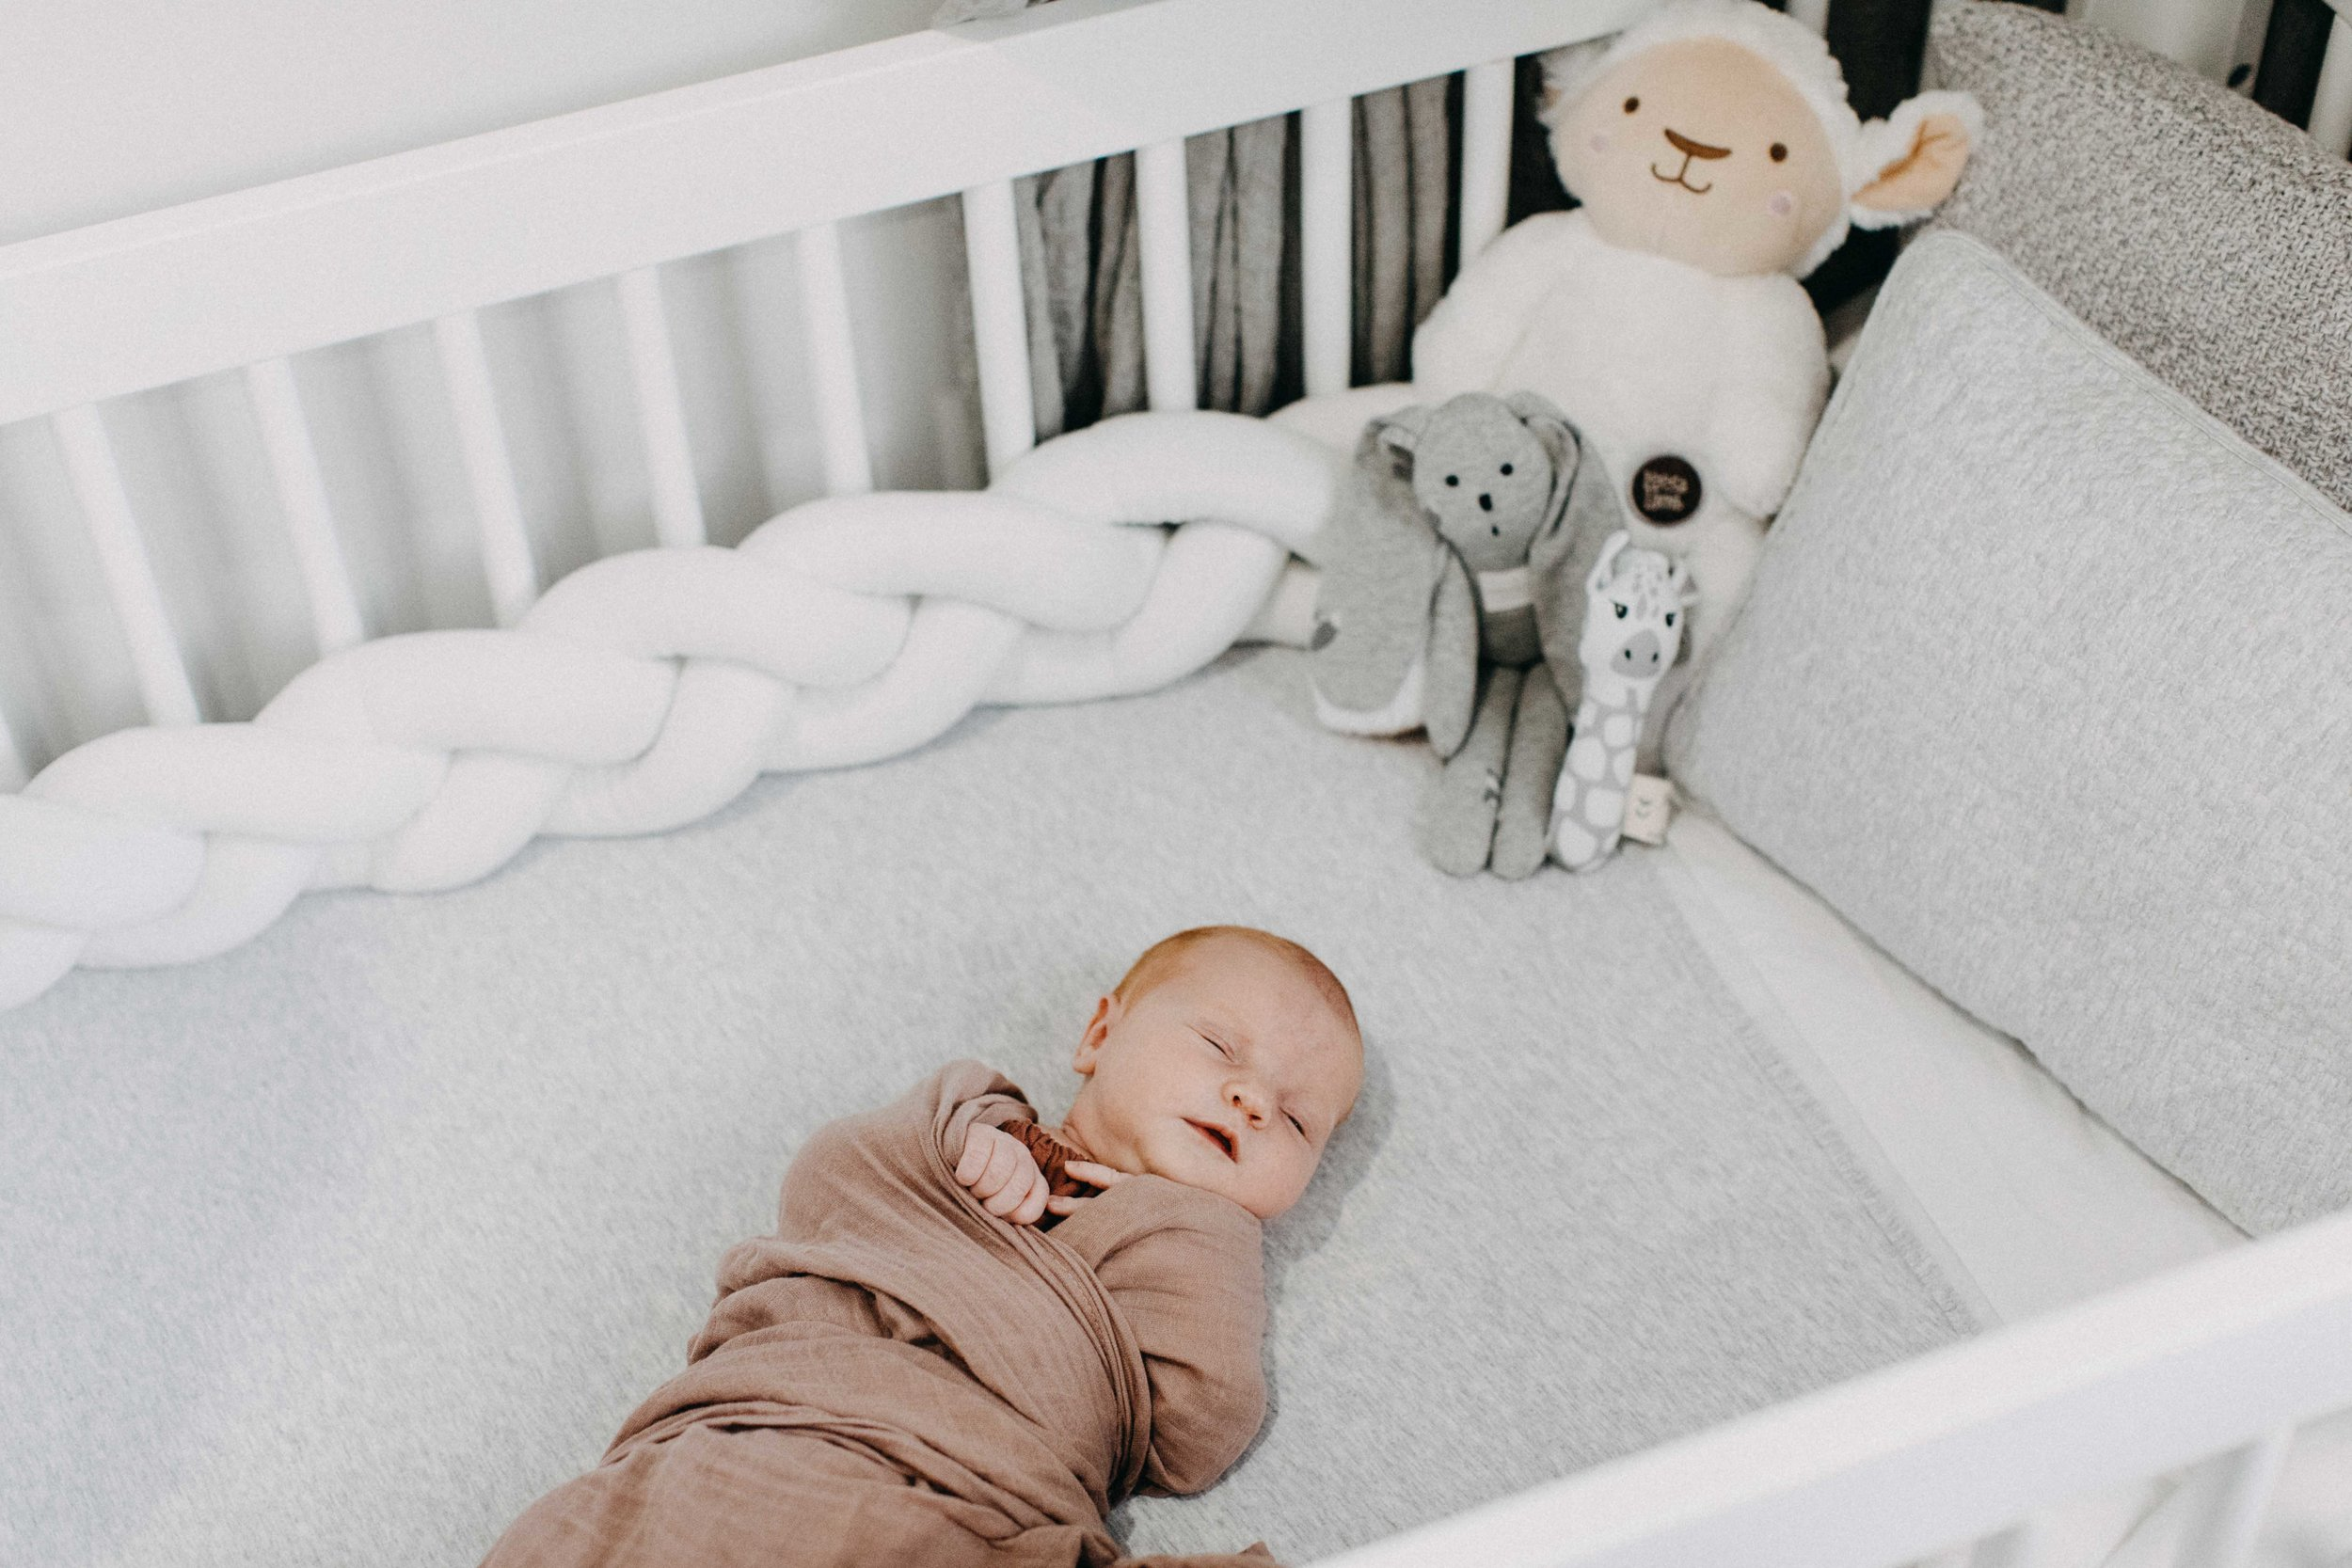 picton-newborn-photography-www.emilyobrienphotography.net-macarthur-wollondilly-arlo-20.jpg